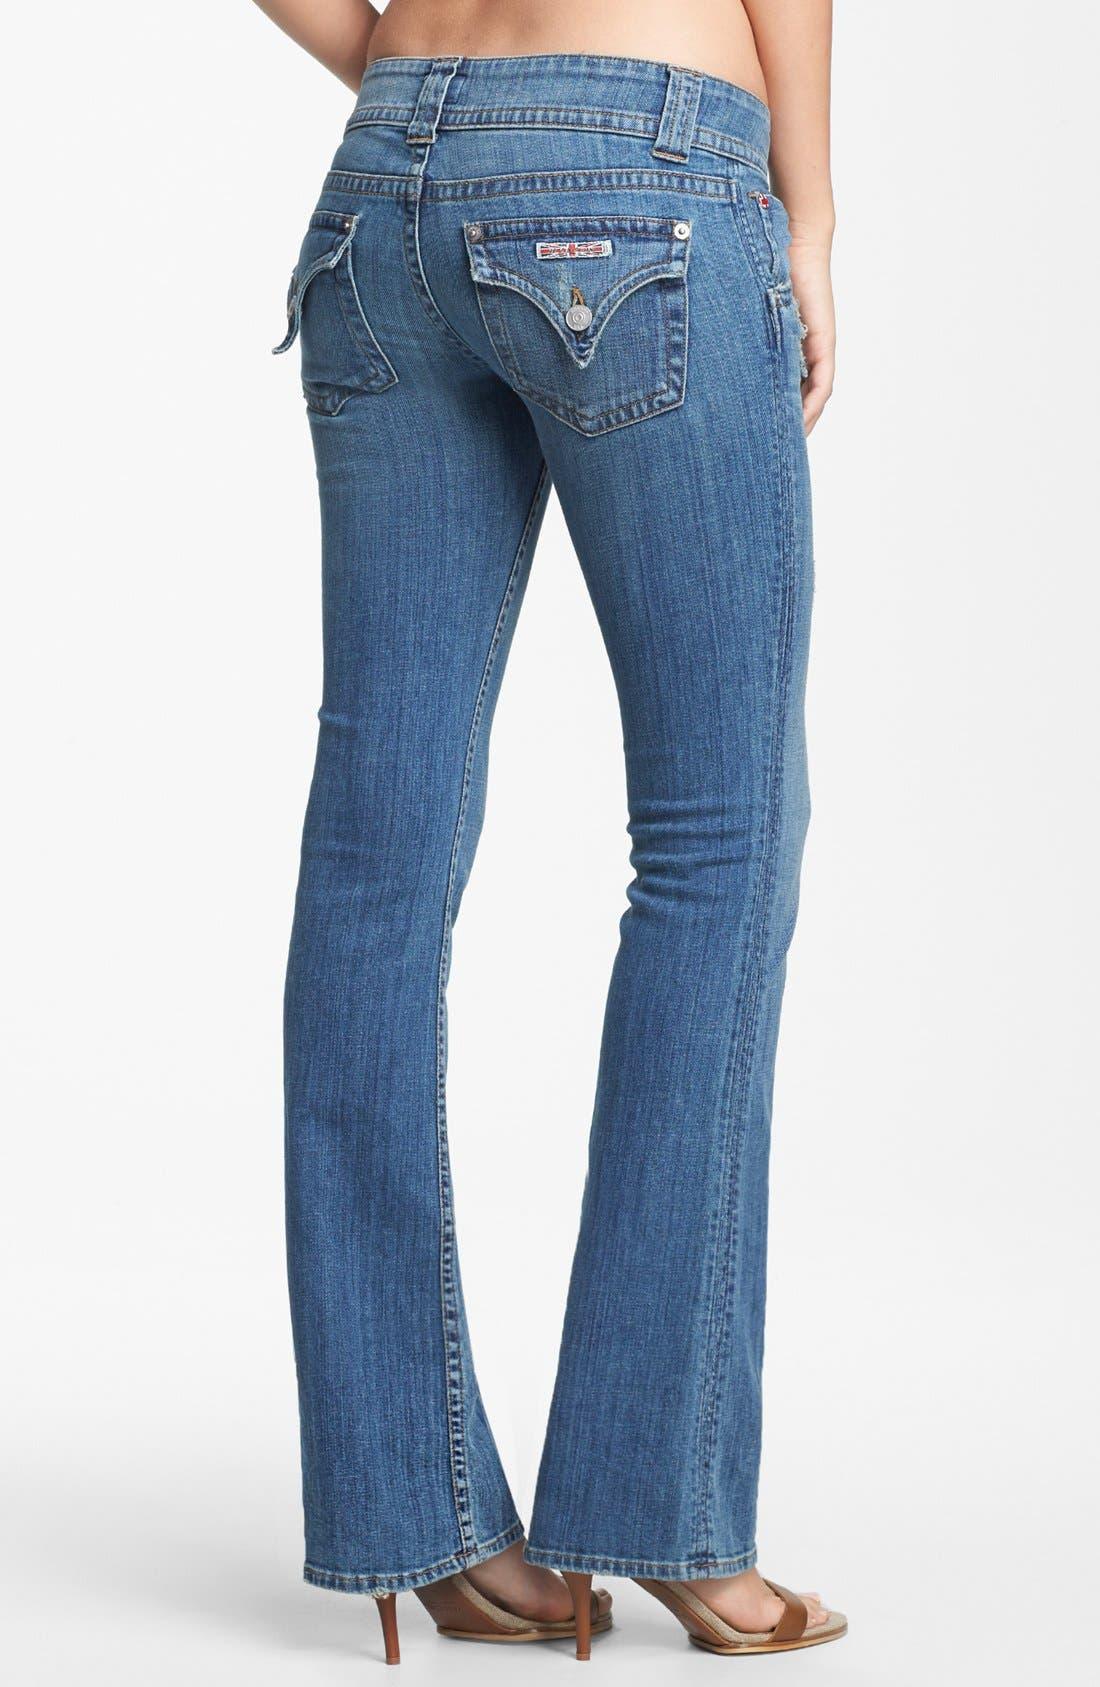 Alternate Image 2  - Hudson Jeans Triangle Pocket Bootcut Stretch Jeans (Vintage Napoli) (Petite)